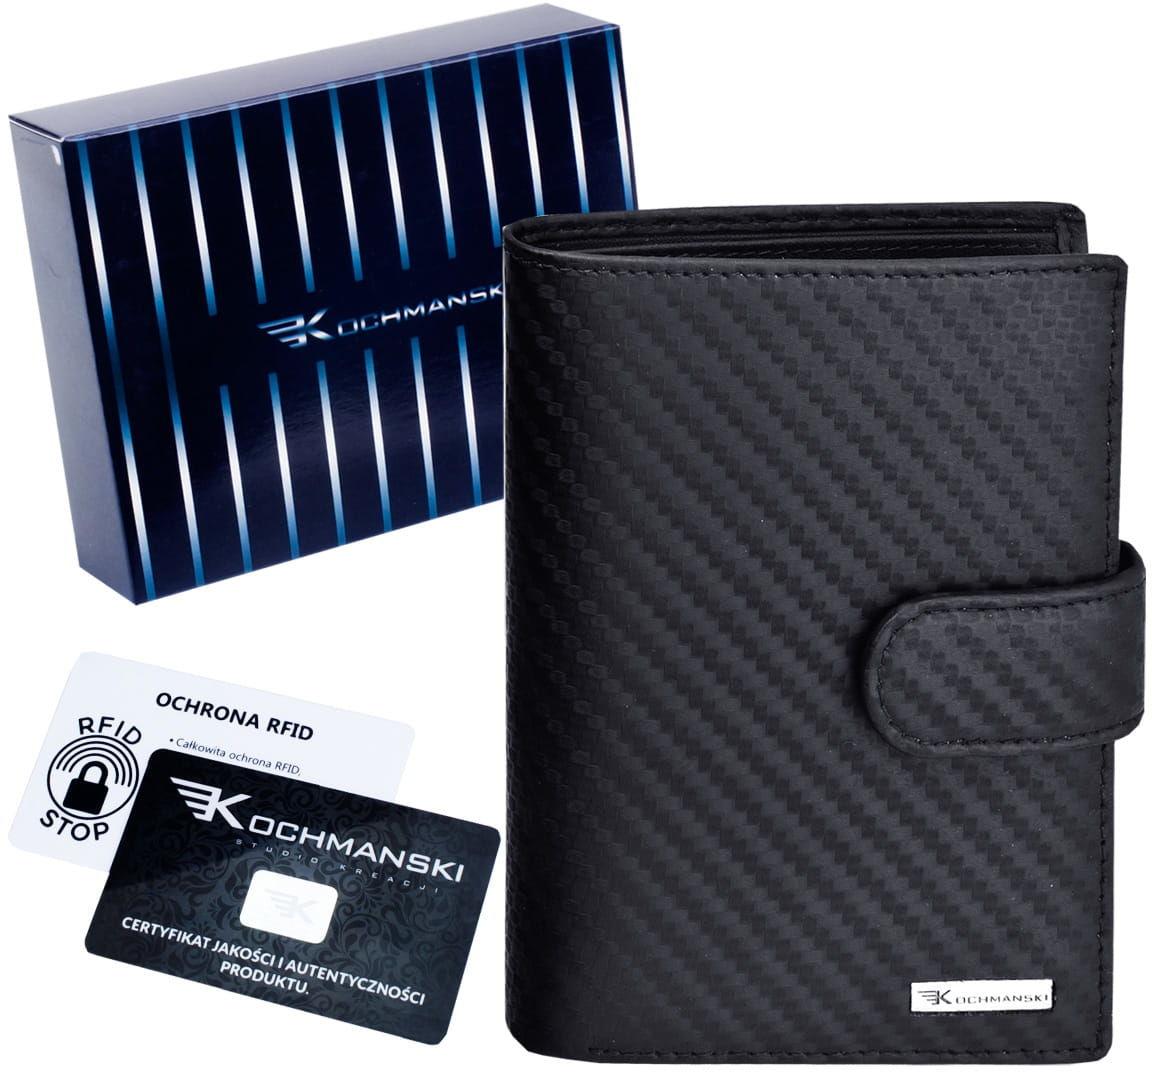 KOCHMANSKI skórzany portfel męski PREMIUM 3202